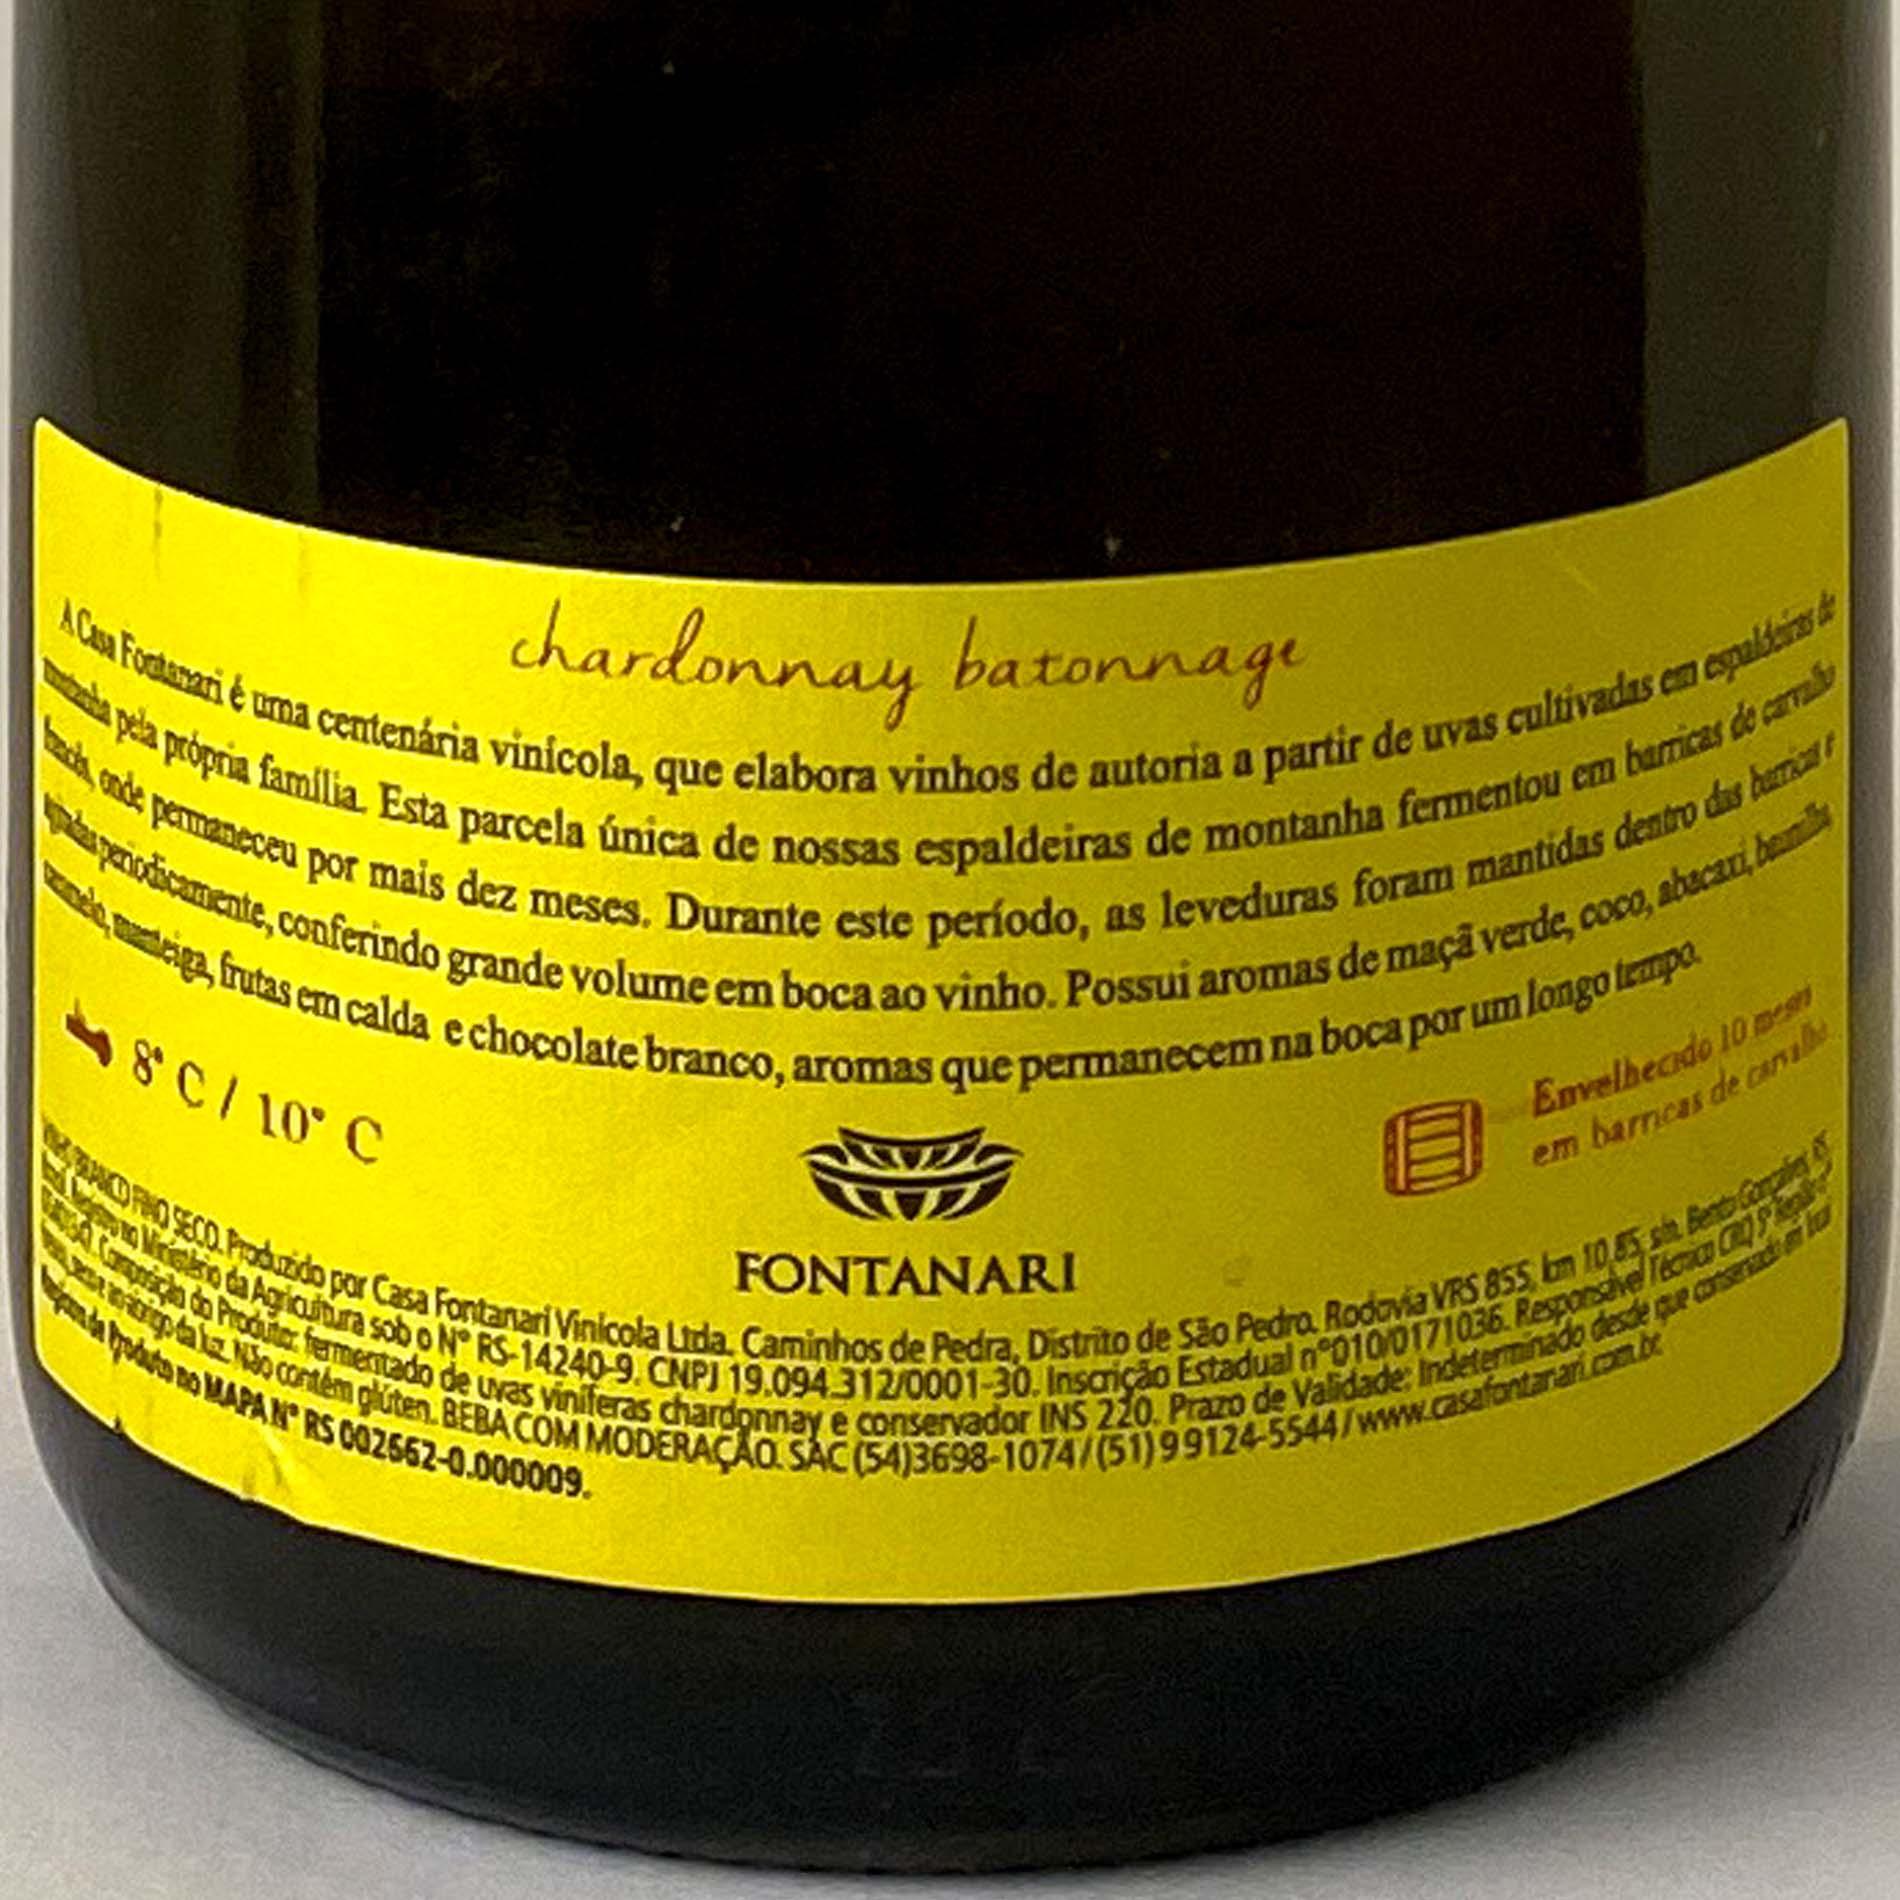 Fontanari Chardonnay Batonage  - Vinerize